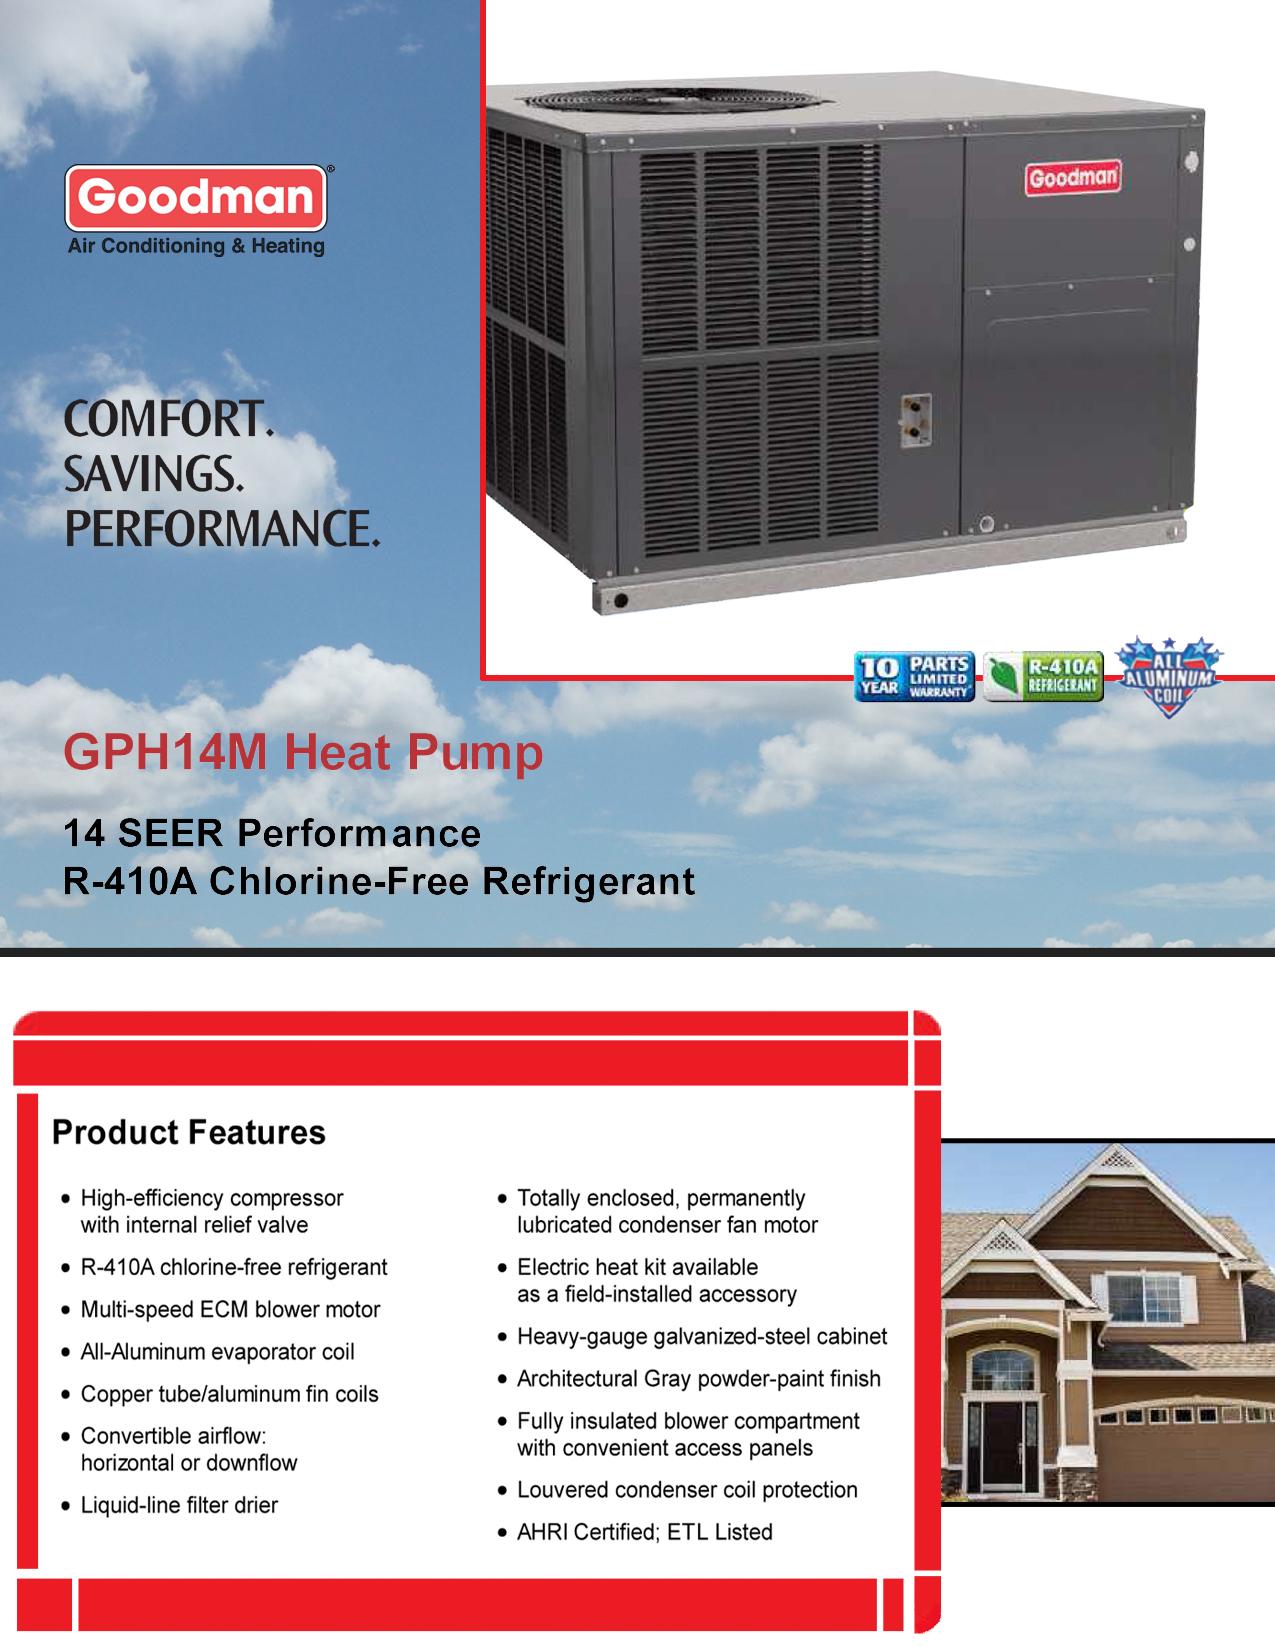 2 5 ton goodman 14 seer heat pump r 410a down flow or. Black Bedroom Furniture Sets. Home Design Ideas